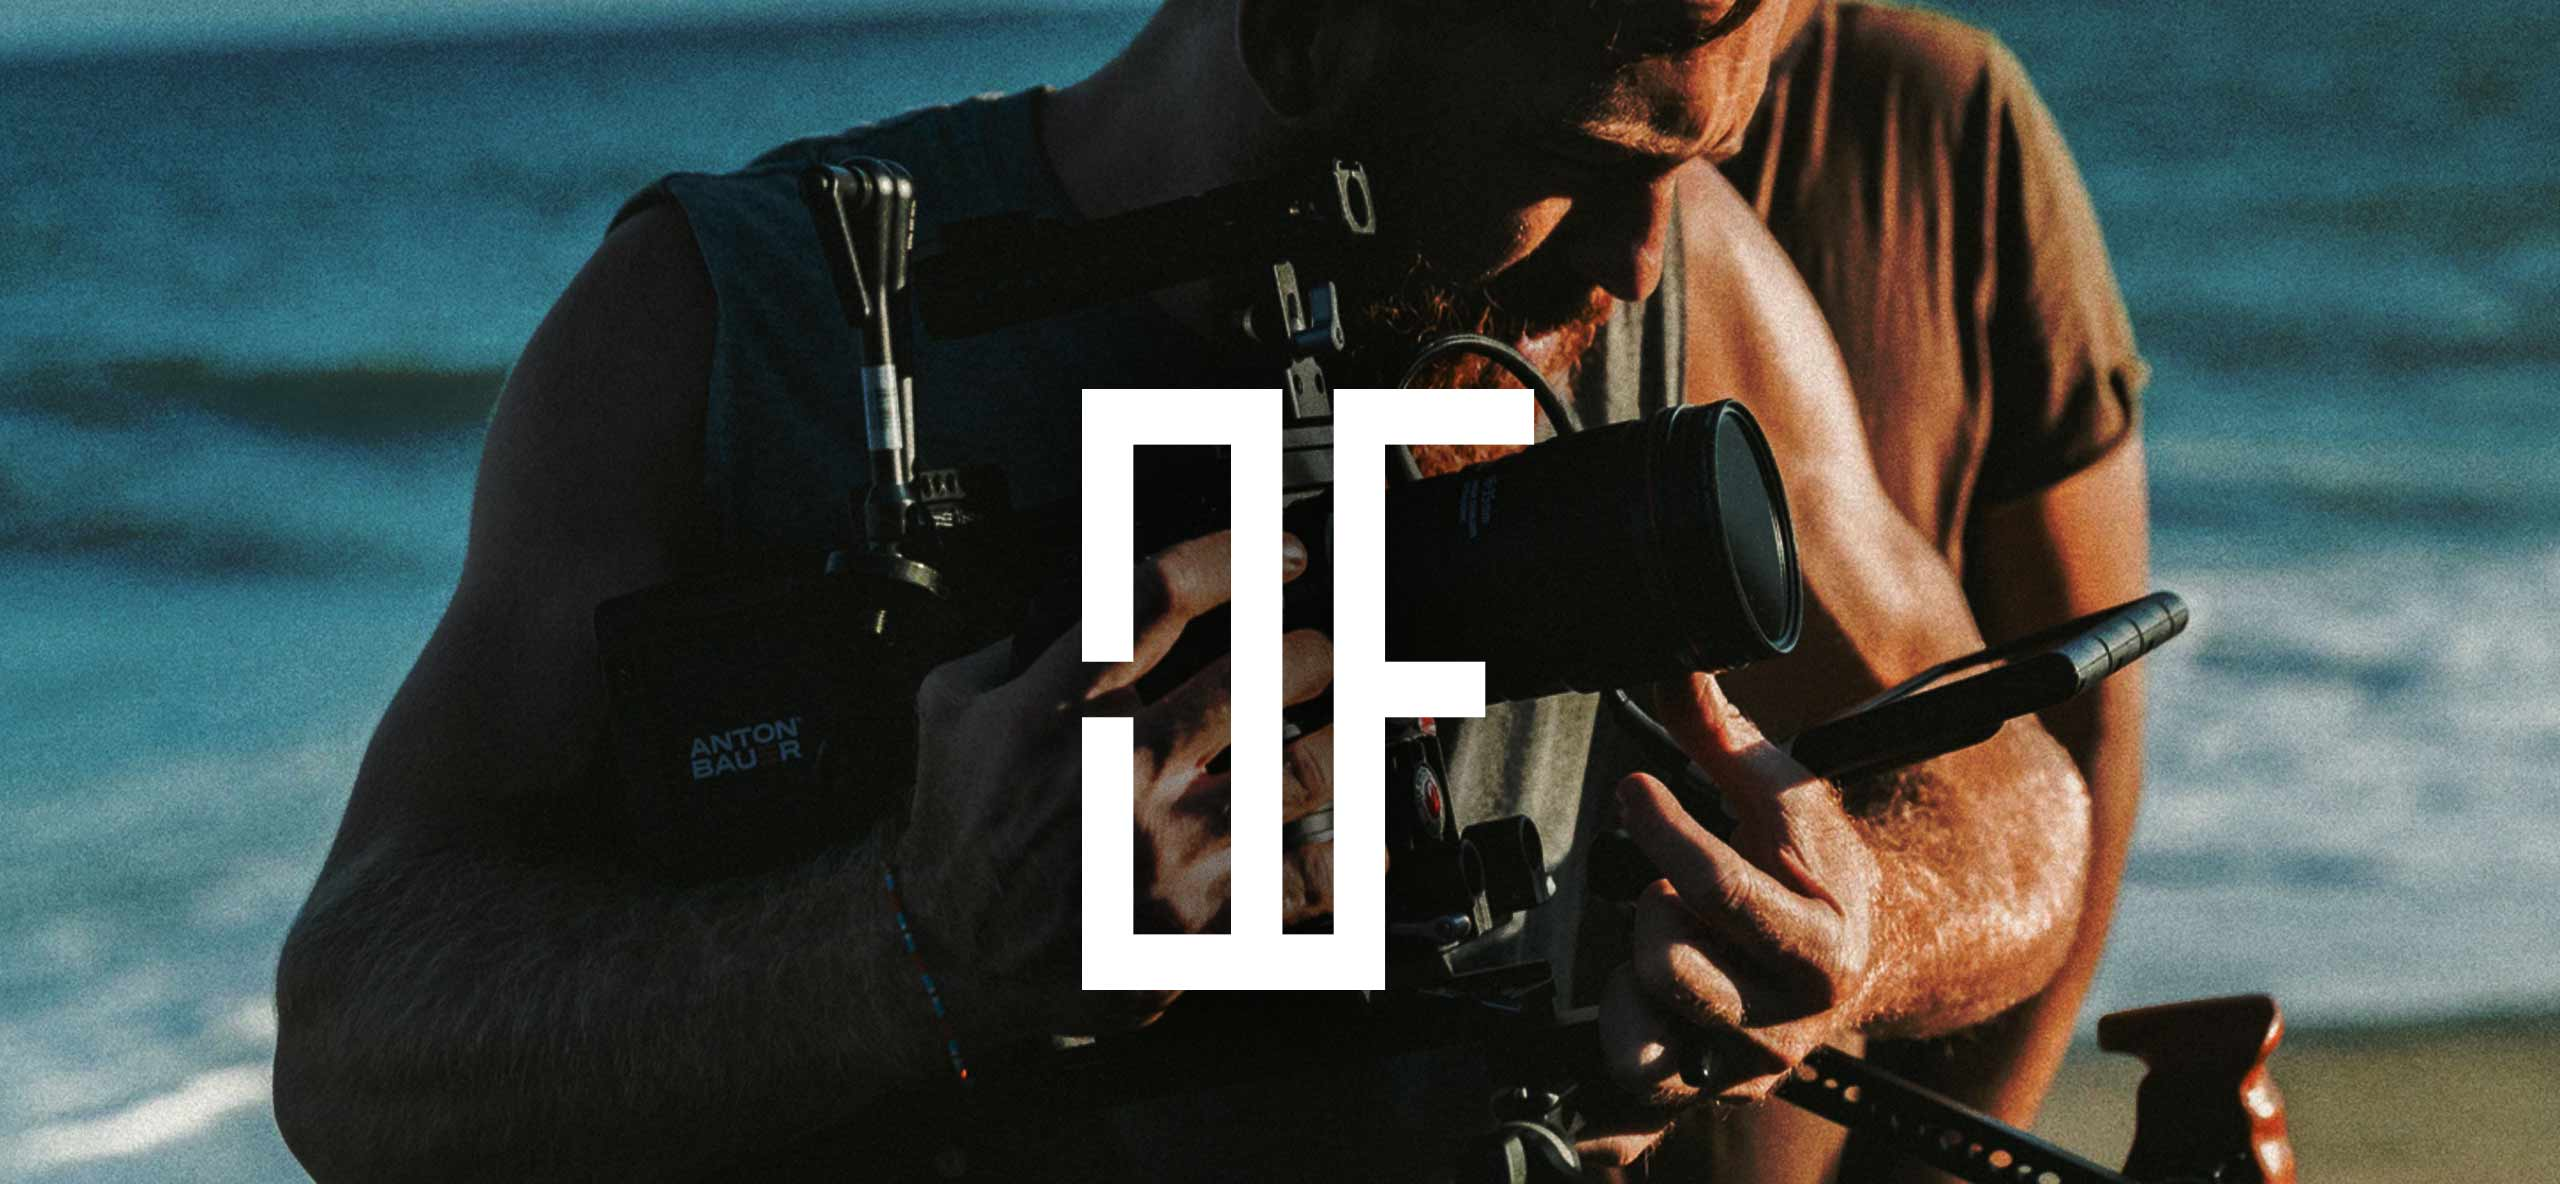 Digital Freedom Films